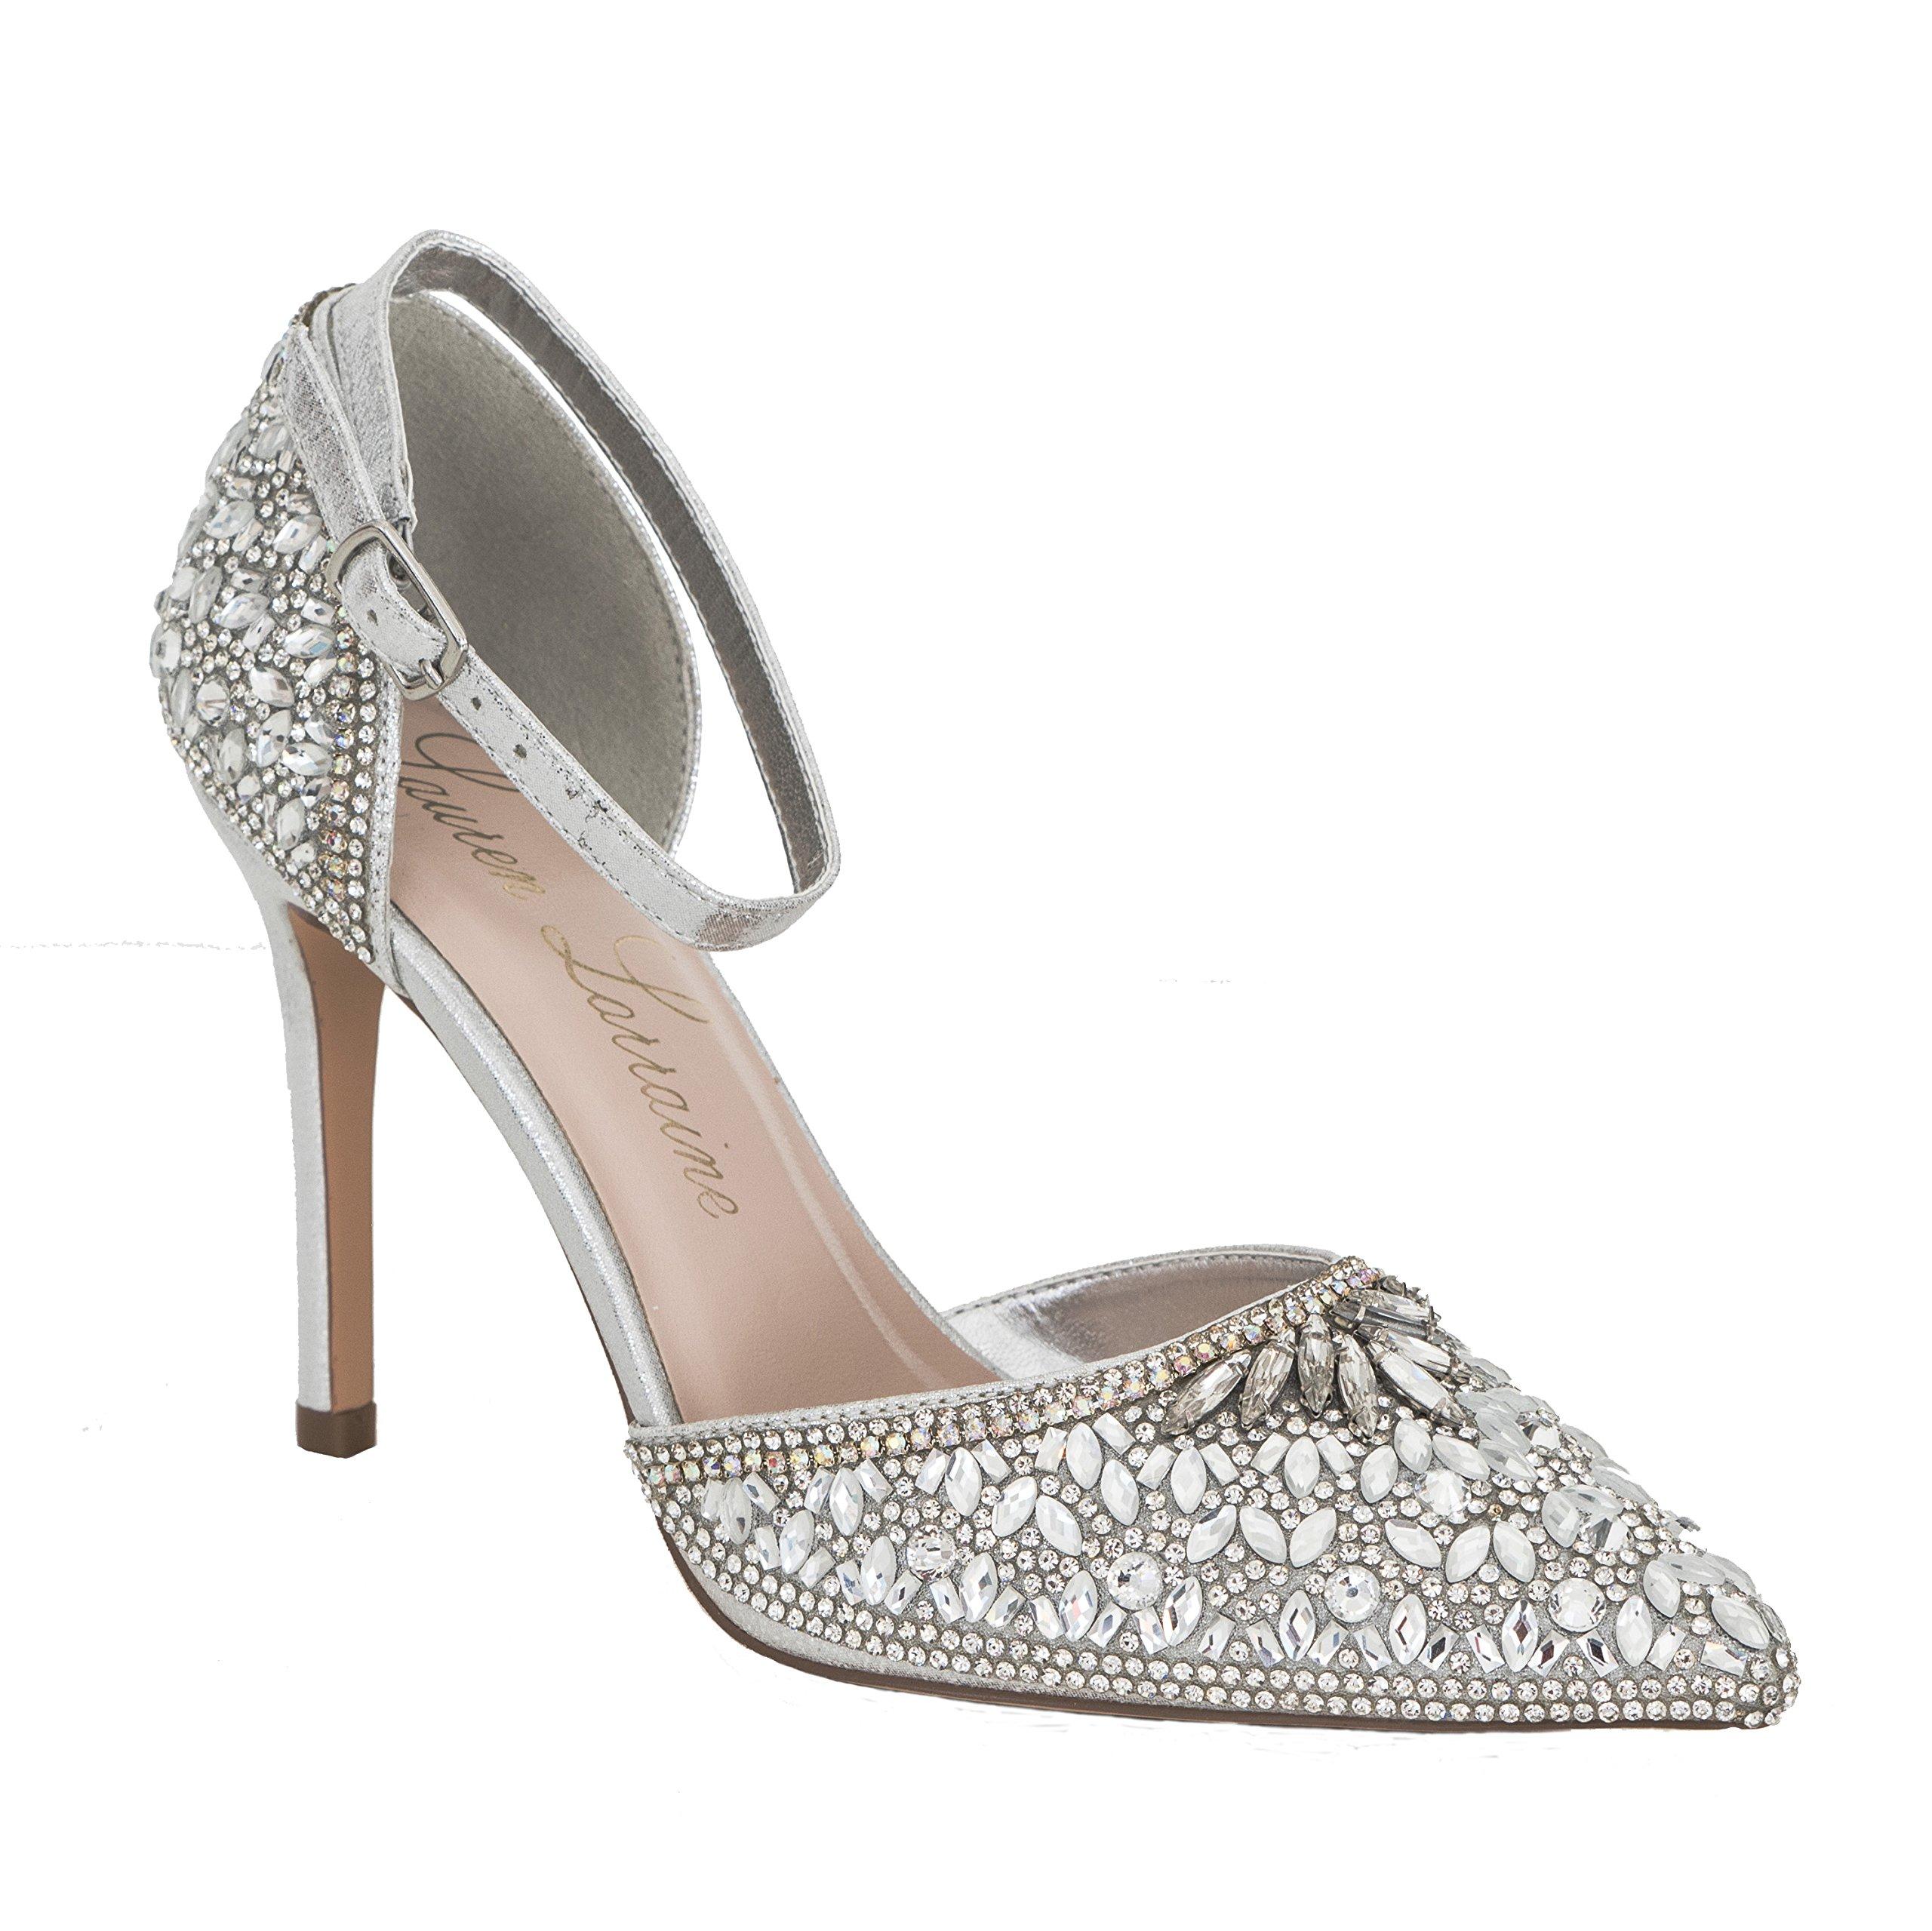 Lauren Lorraine Rose Crystal Women's Evening Dress Rosegold High Heel Ankle Strap D'Orsay Pointed Toe Wedding Pump Silver Size 7